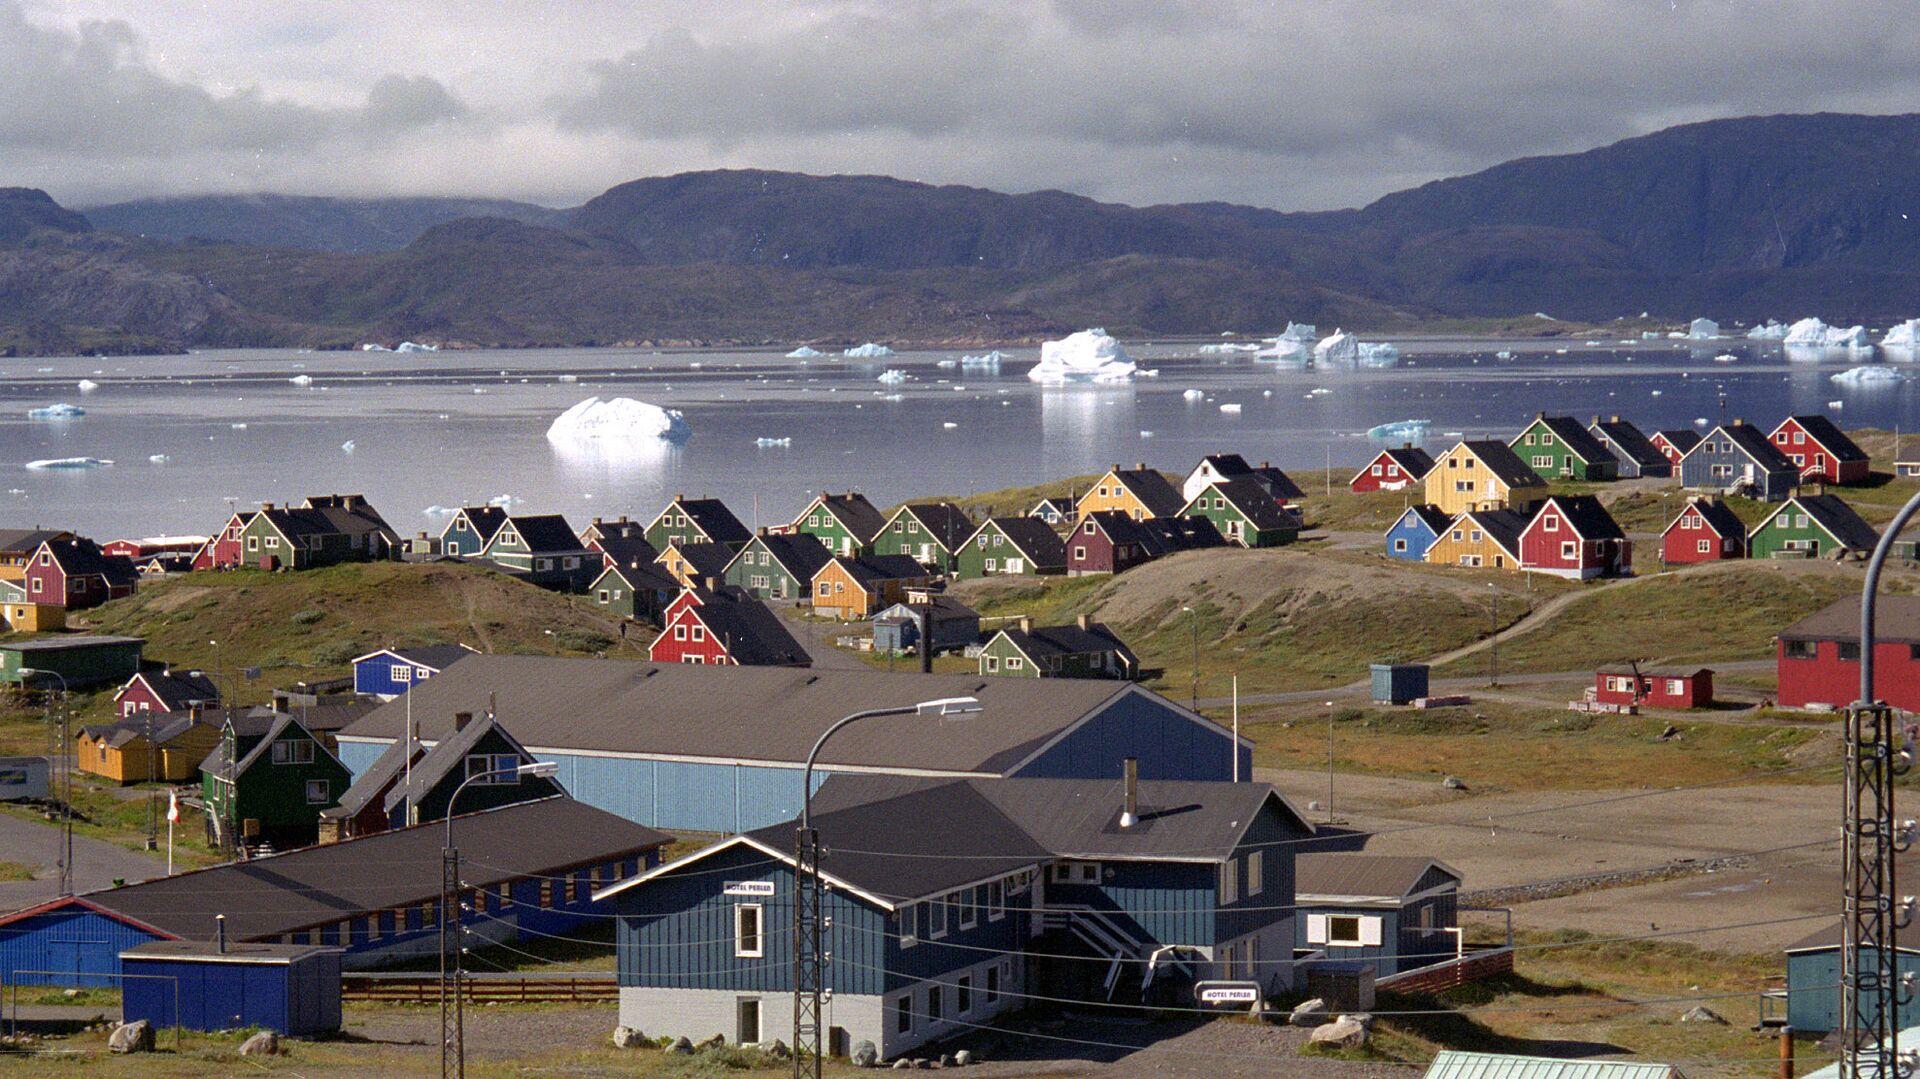 Groenlandia - Sputnik Italia, 1920, 21.05.2021